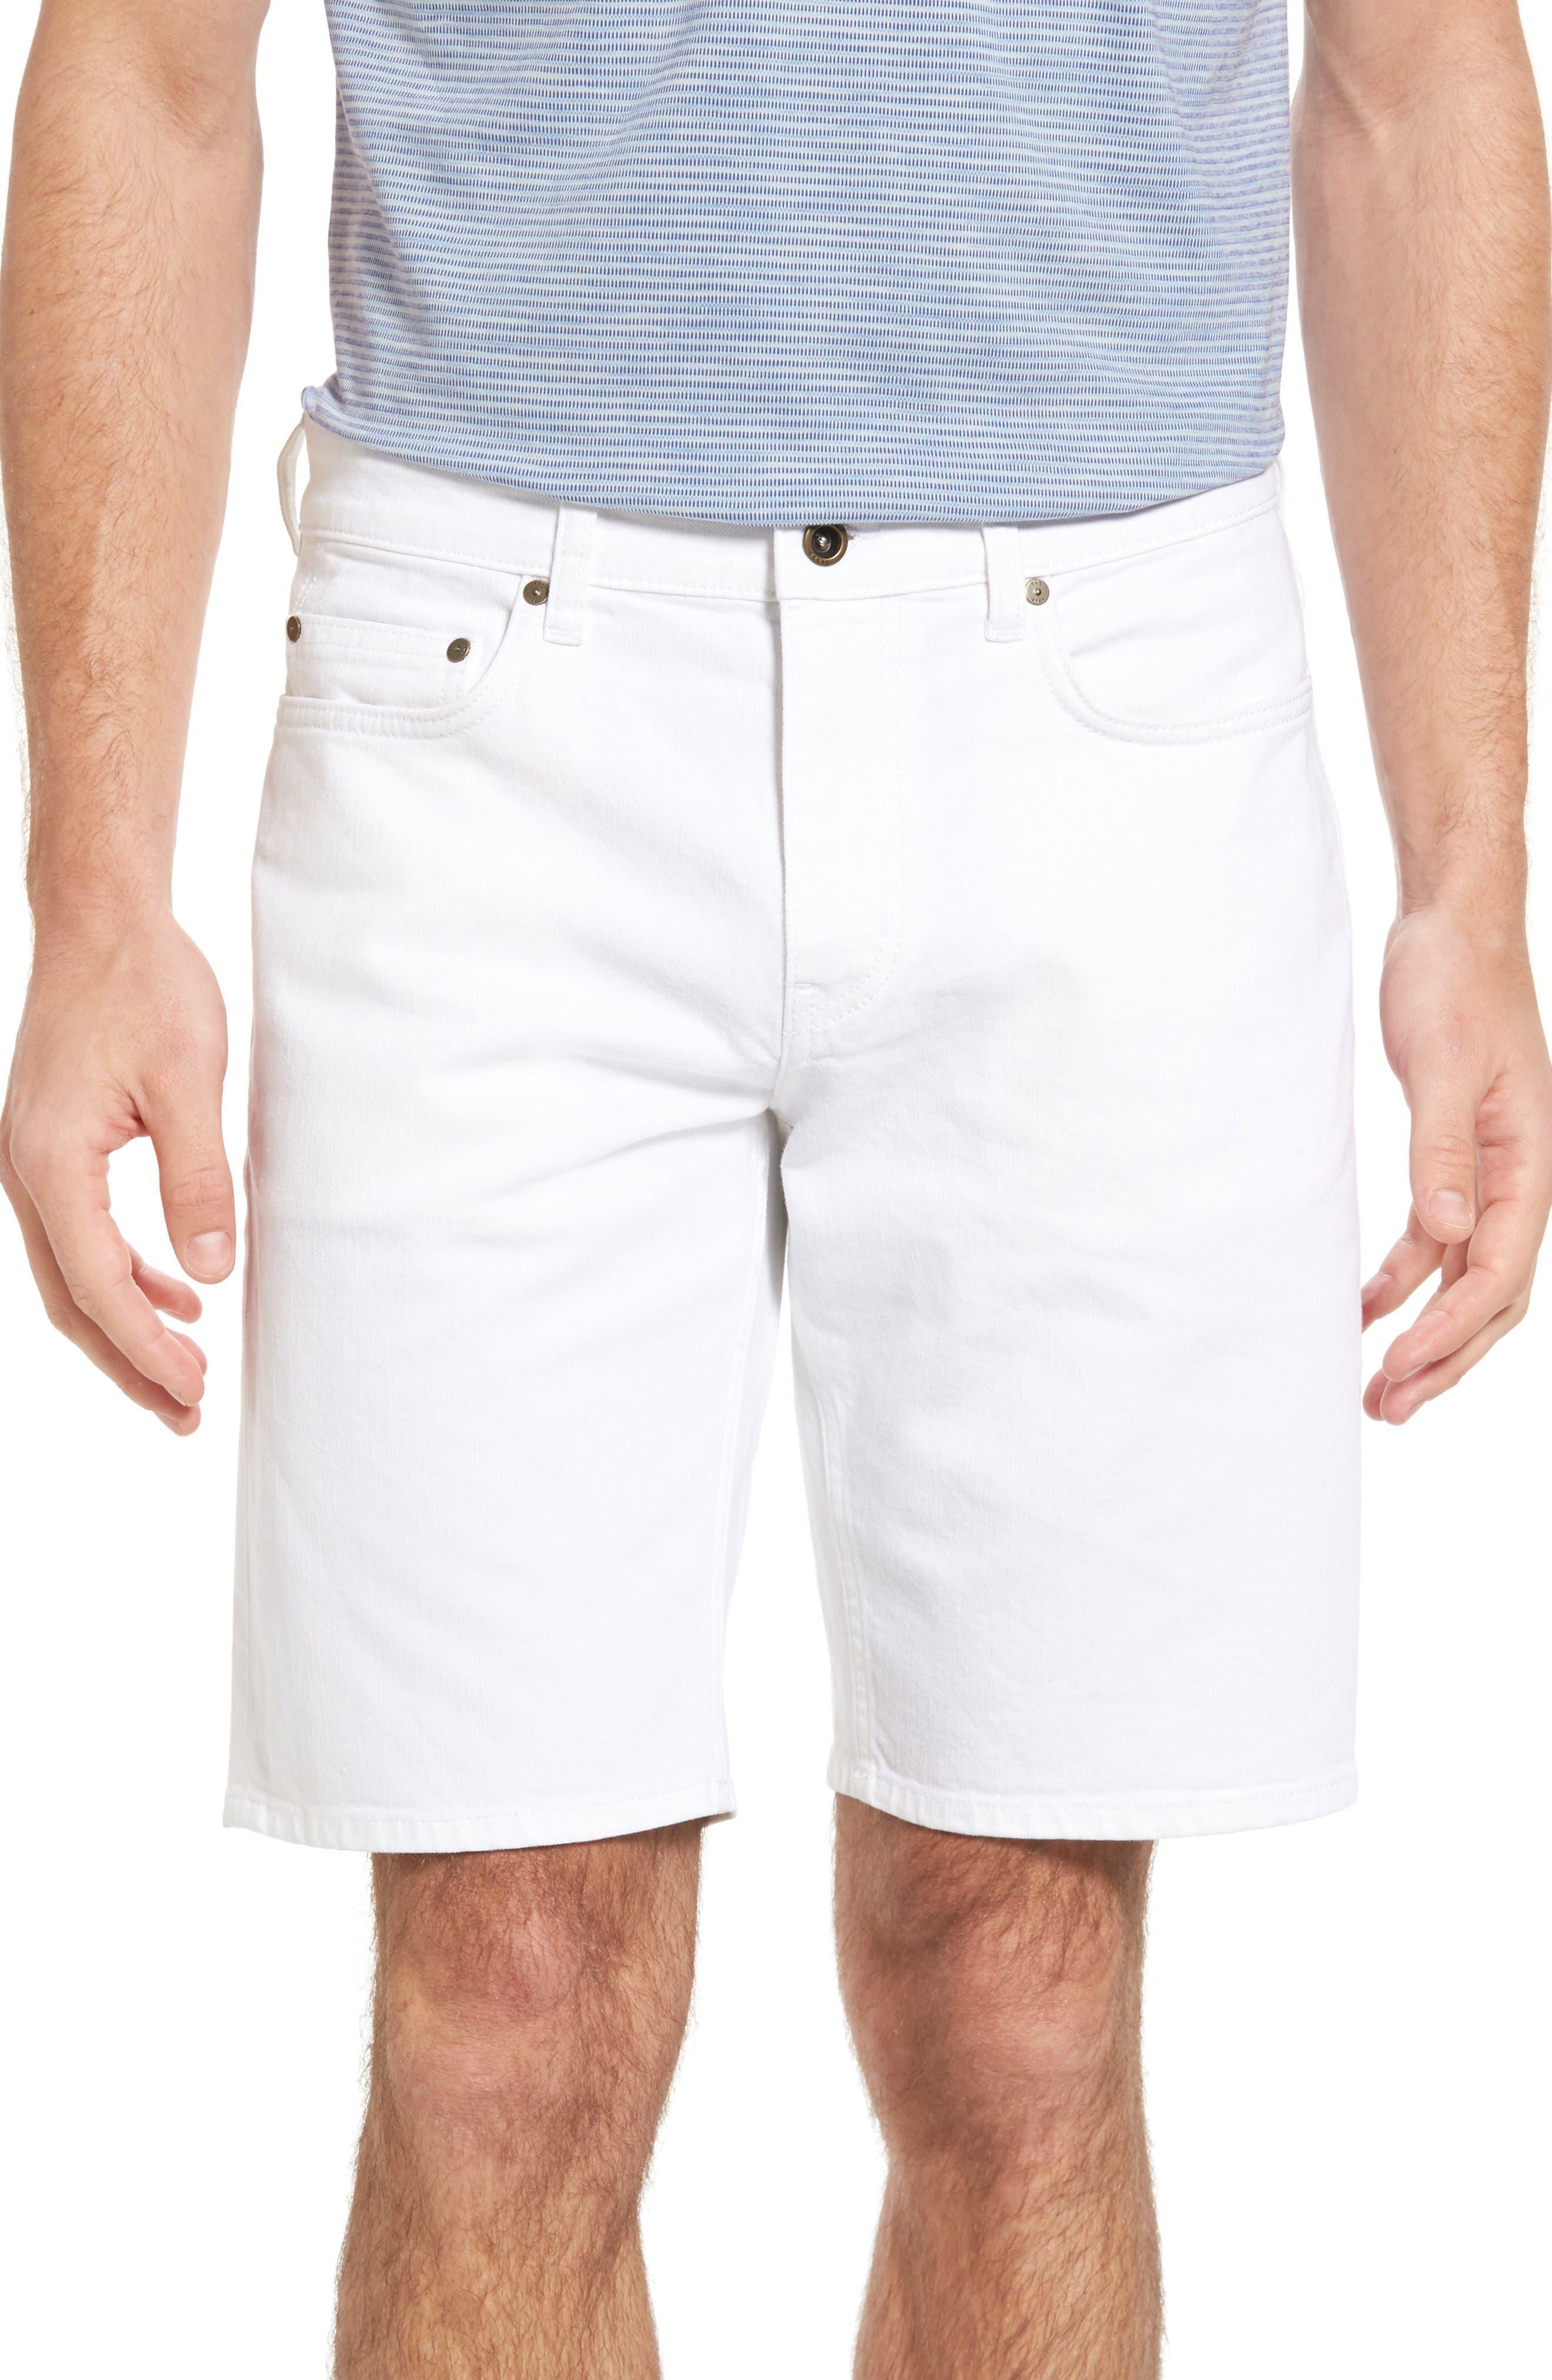 Alternate Image 1 Selected - Rodd & Gunn Orana Shorts